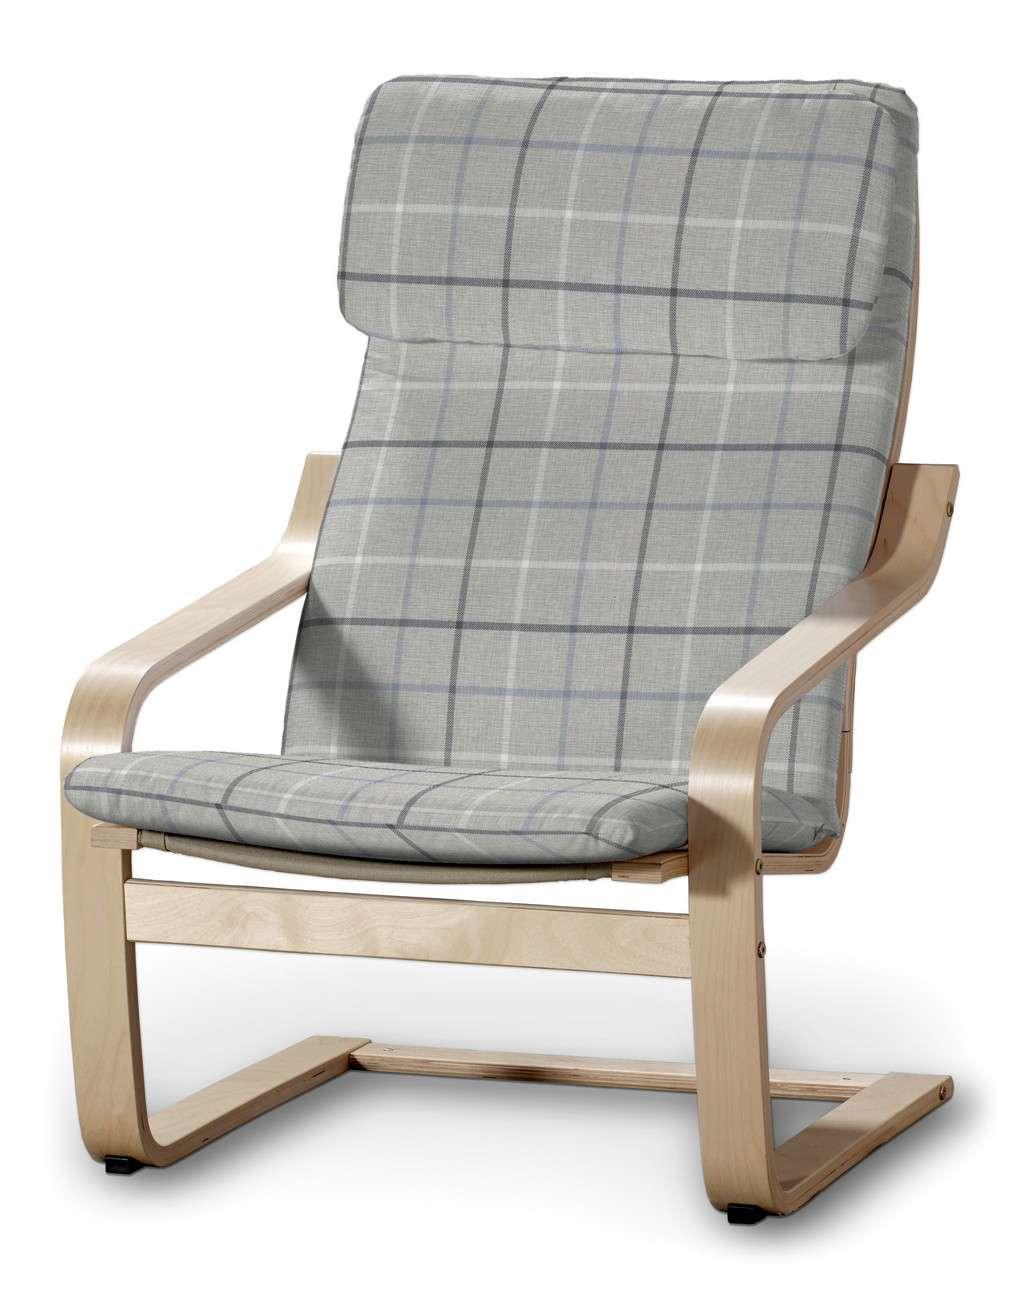 Poduszka na fotel Poäng w kolekcji Edinburgh, tkanina: 703-18